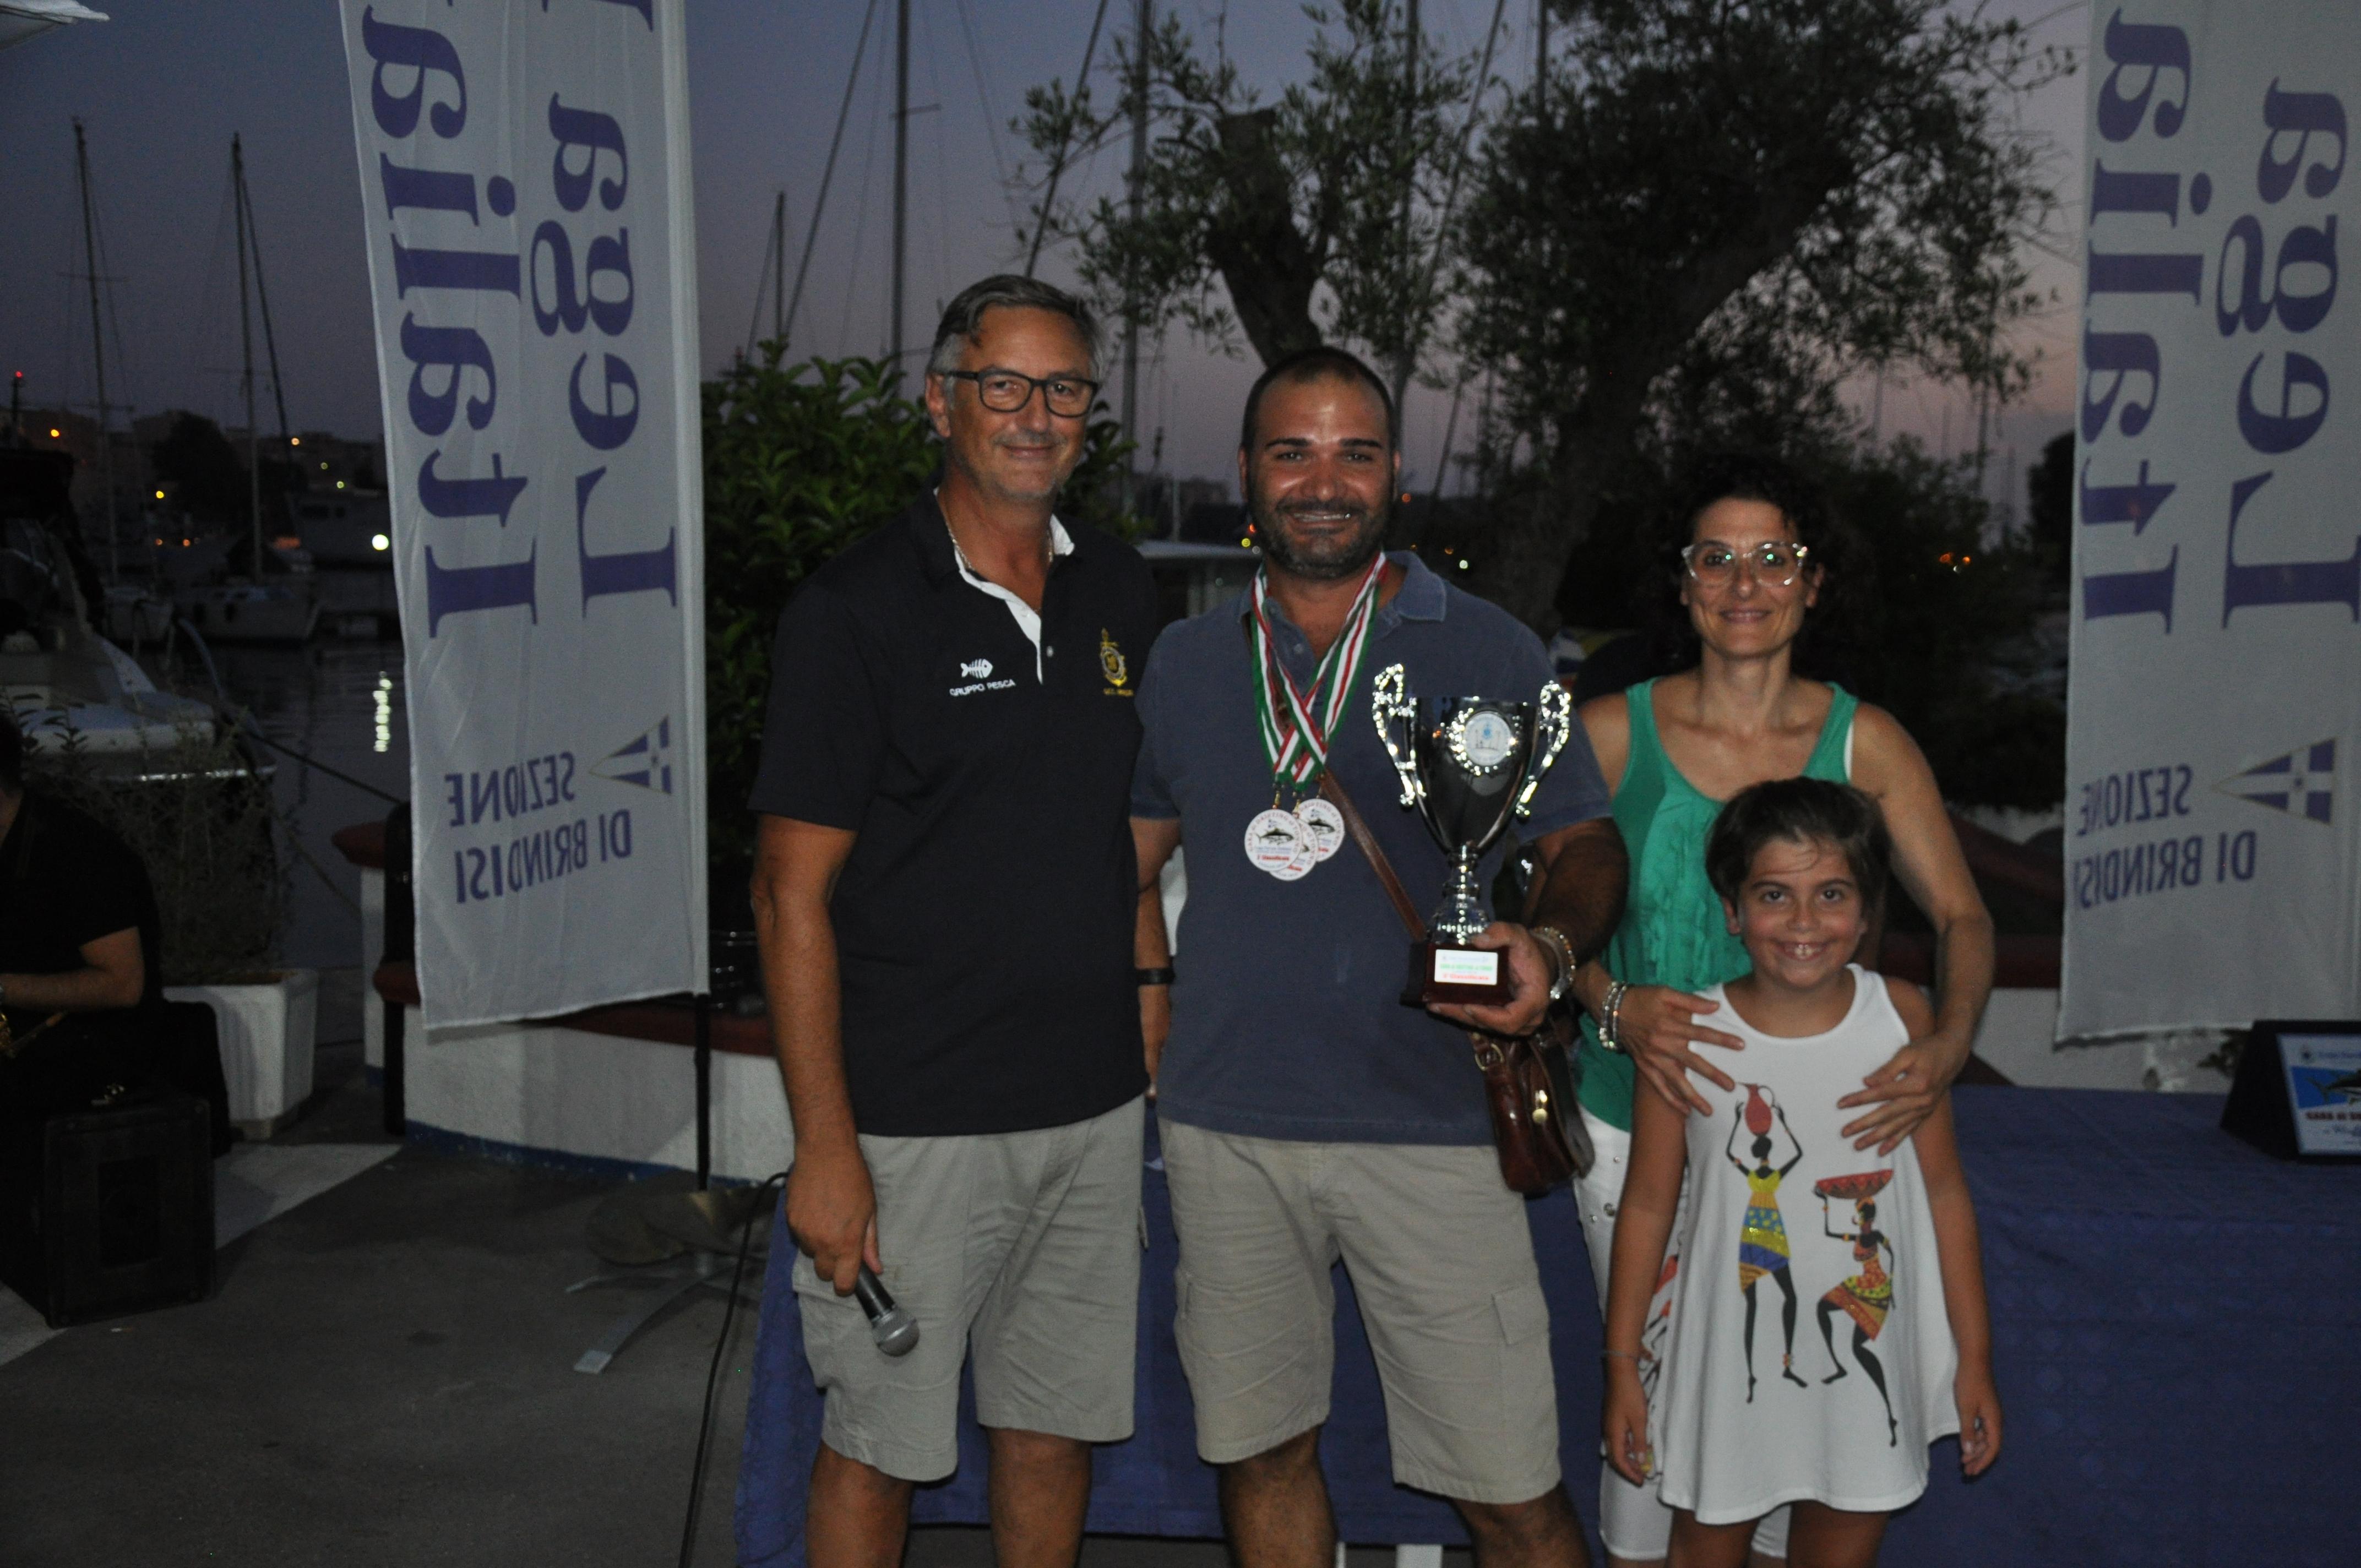 premiazione drifting al tonno 2018 (17)